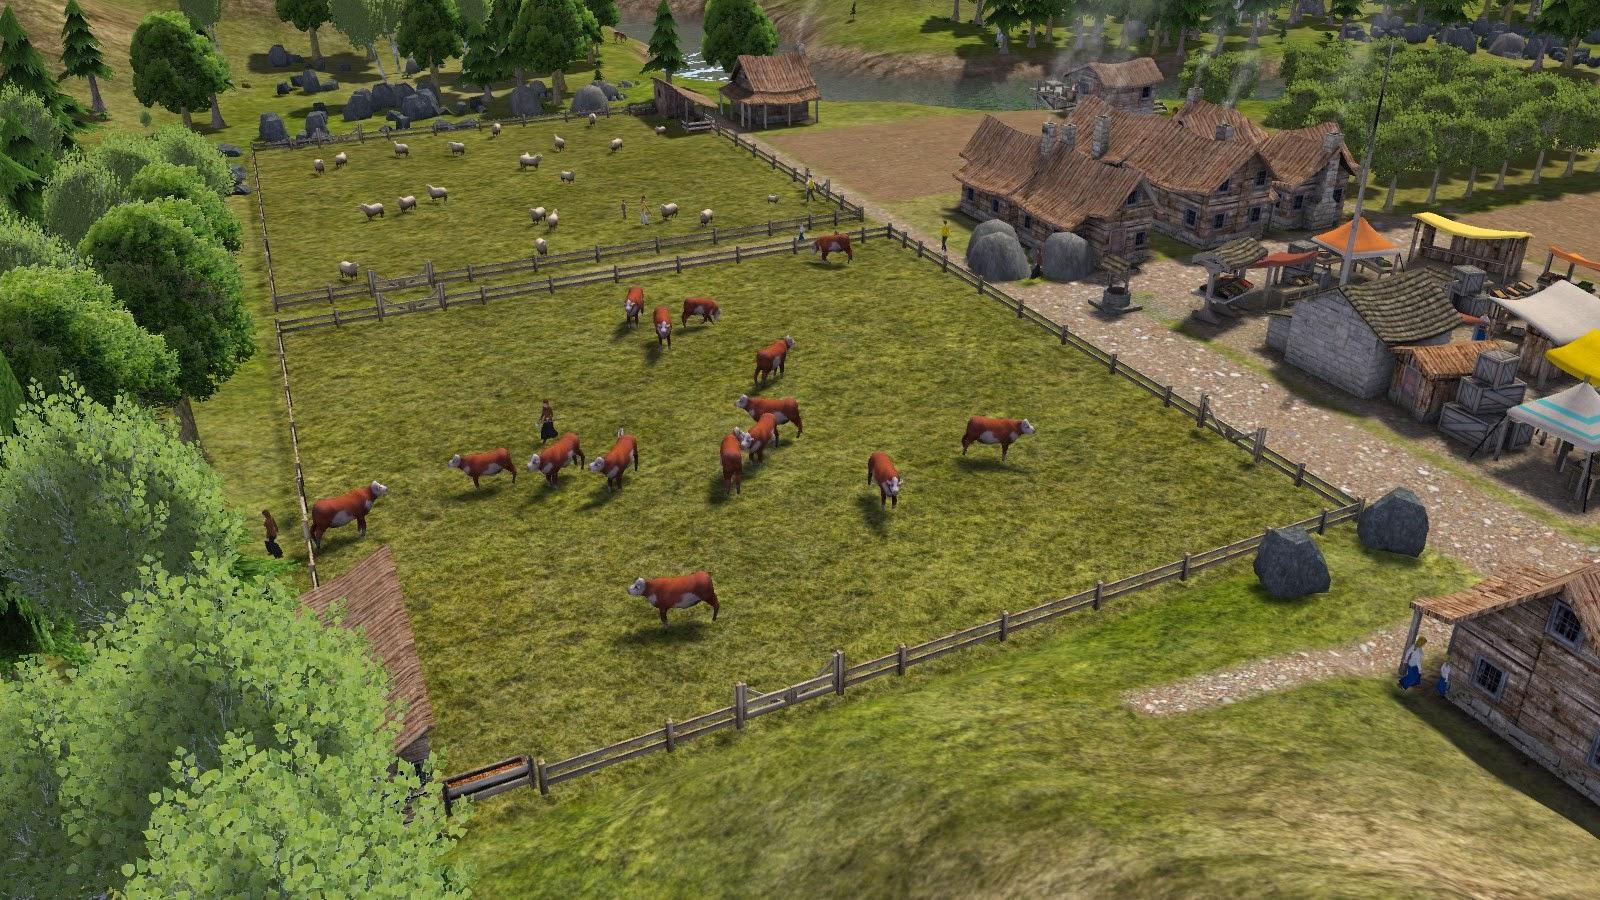 Online games download full version